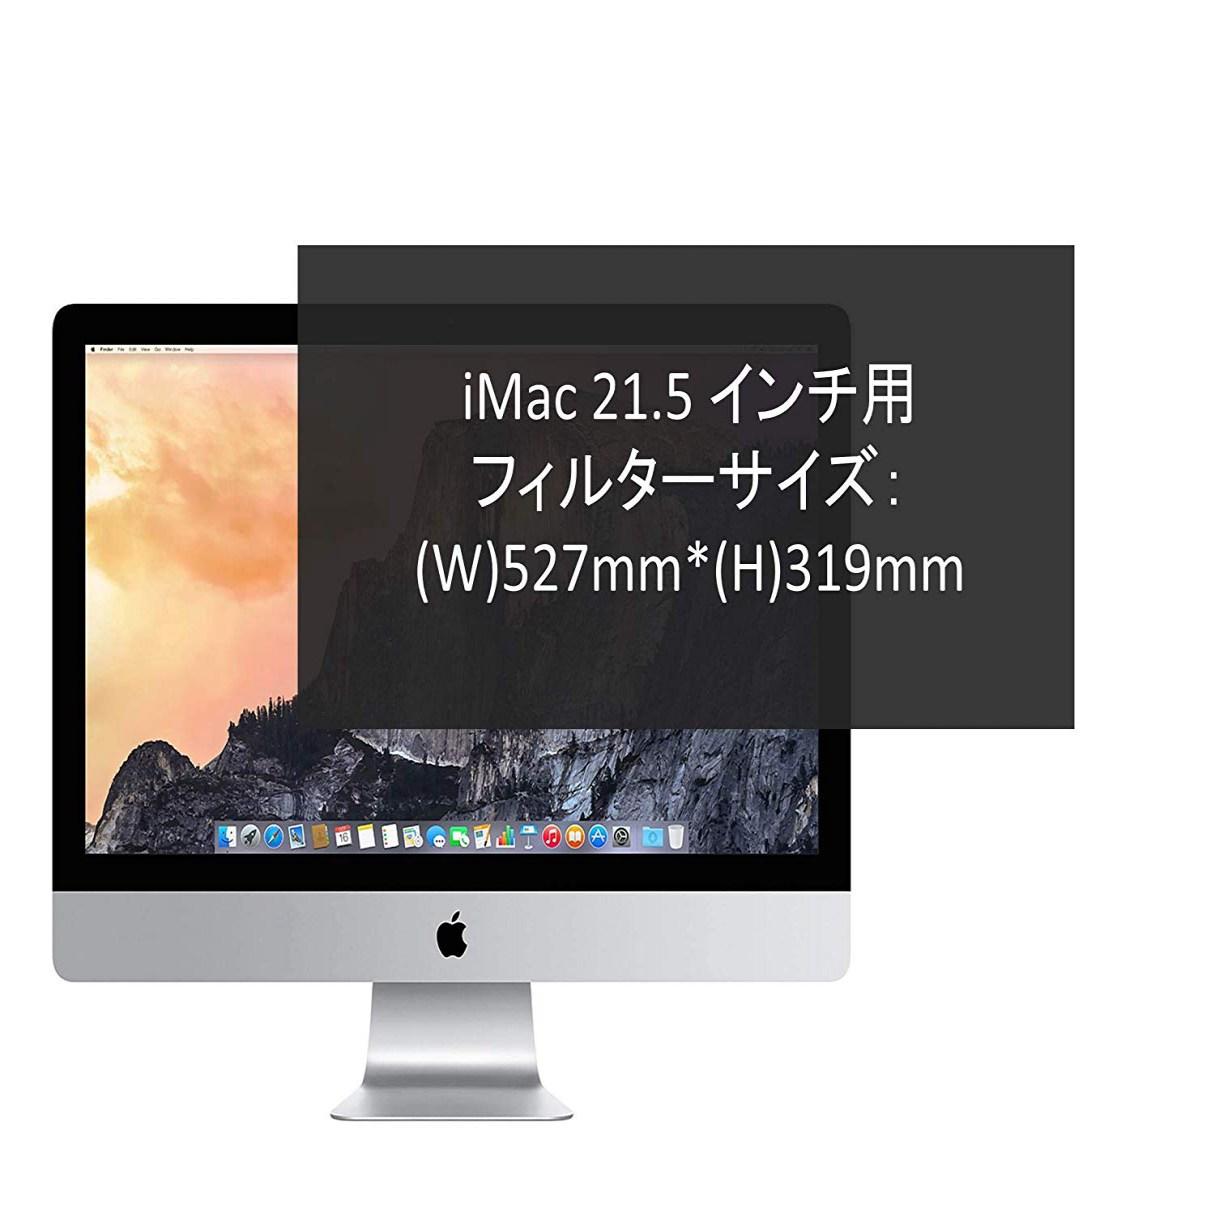 iMac 21 覗き見防止 YMYWorld 粘着シール式 覗き見防止フィルター iMac 21.5インチ用 プライバシーフィルター ブルーライトカット 反射防止 (Adhesive iMac21, 1